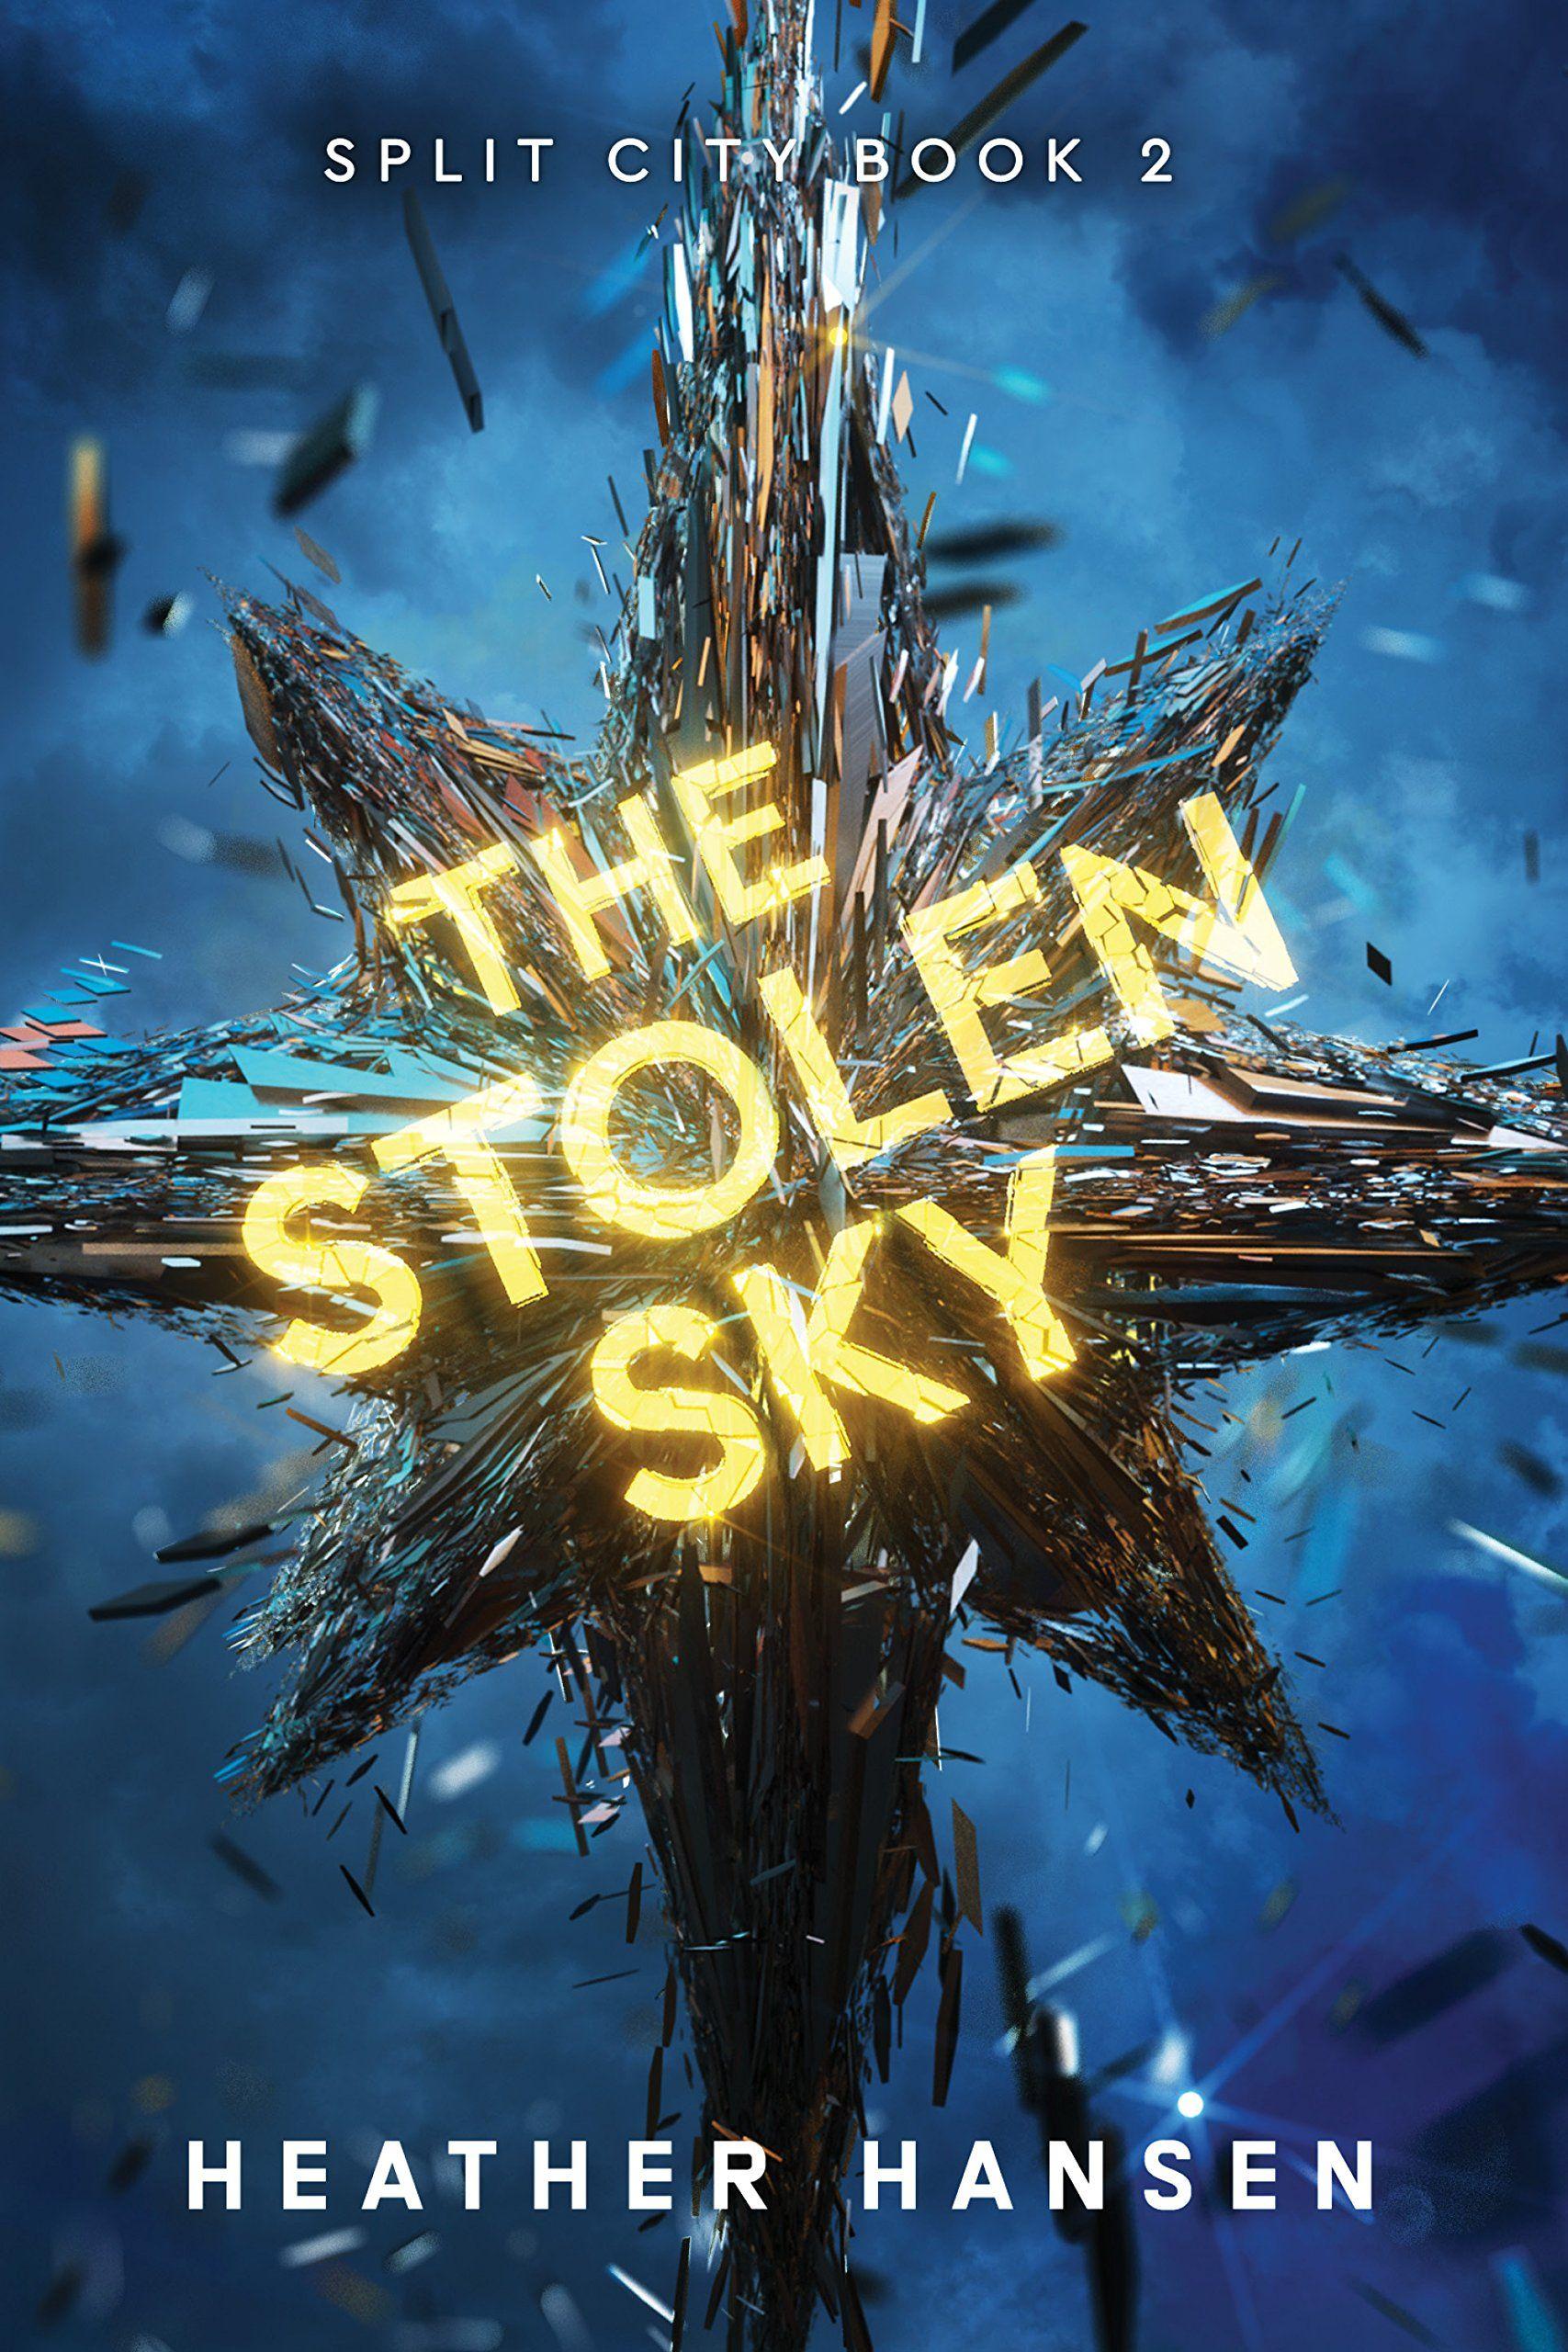 Heather Hansen - The Stolen Sky